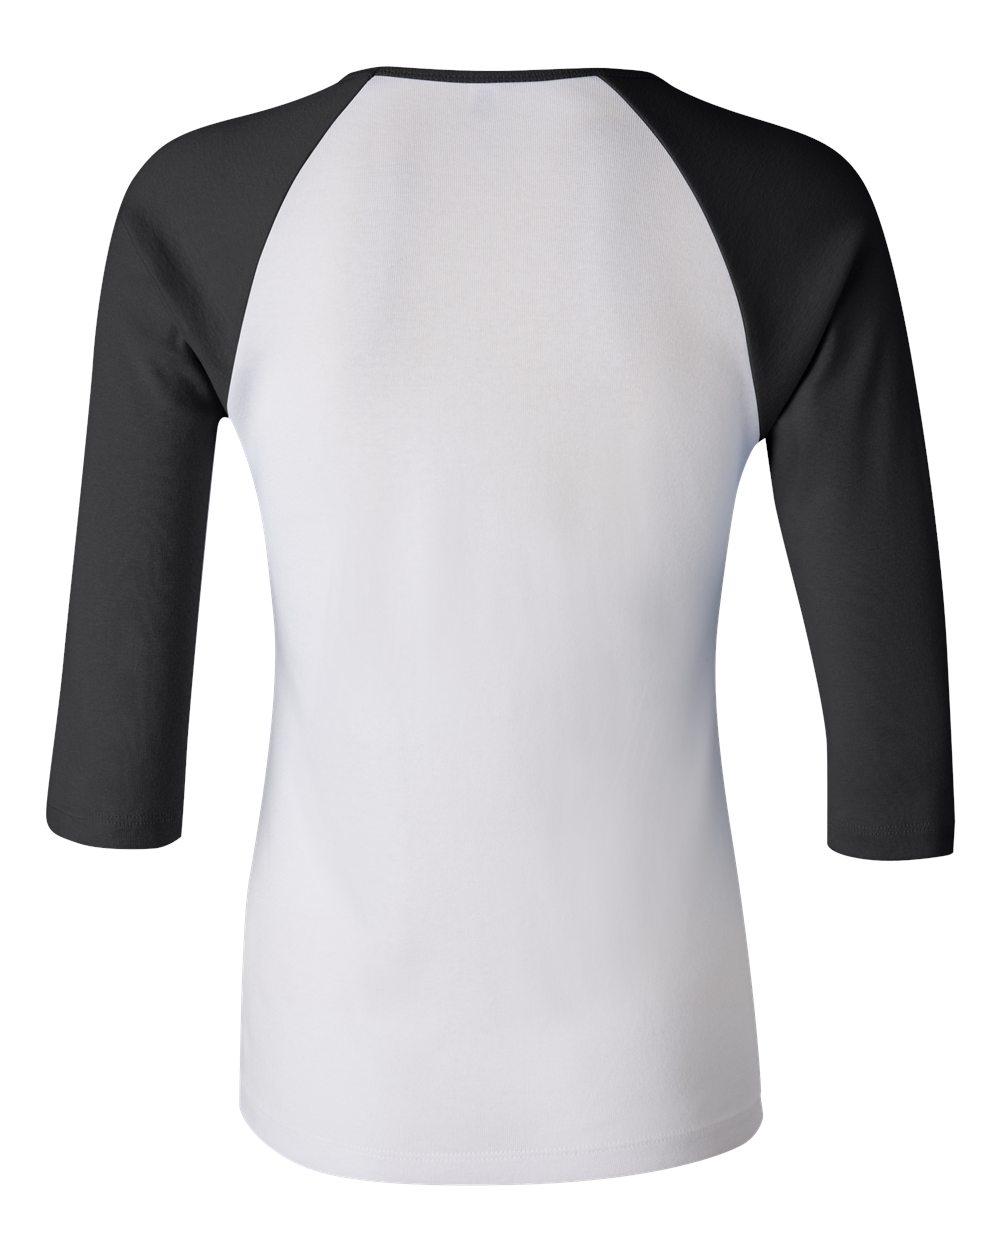 Bella-Canvas-Womens-Stretch-Rib-3-4-Sleeve-Contrast-Raglan-T-Shirt-B2000 thumbnail 14